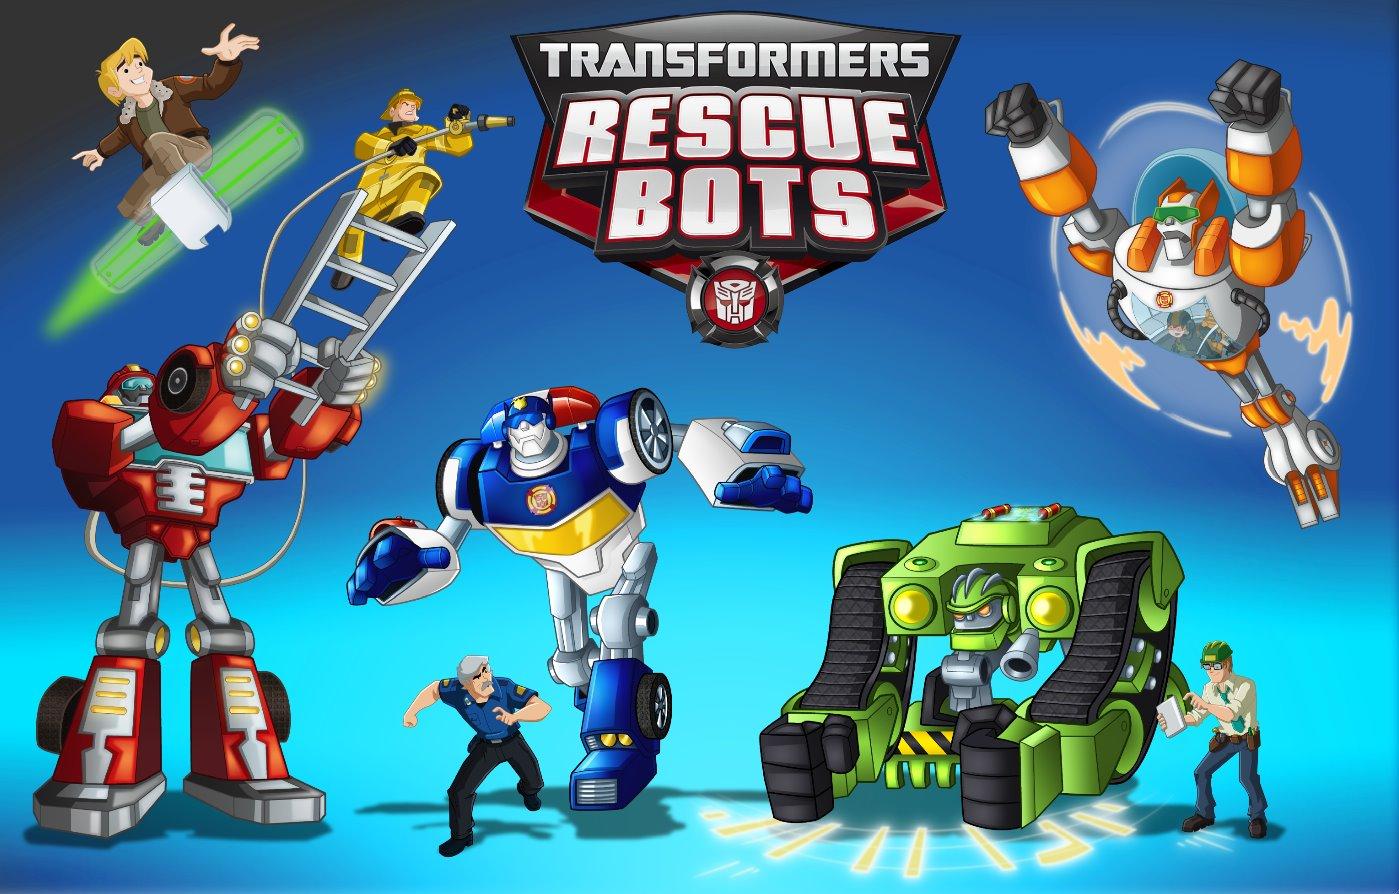 Transformers: Rescue Bots Sneak Peek Poster - Transformers